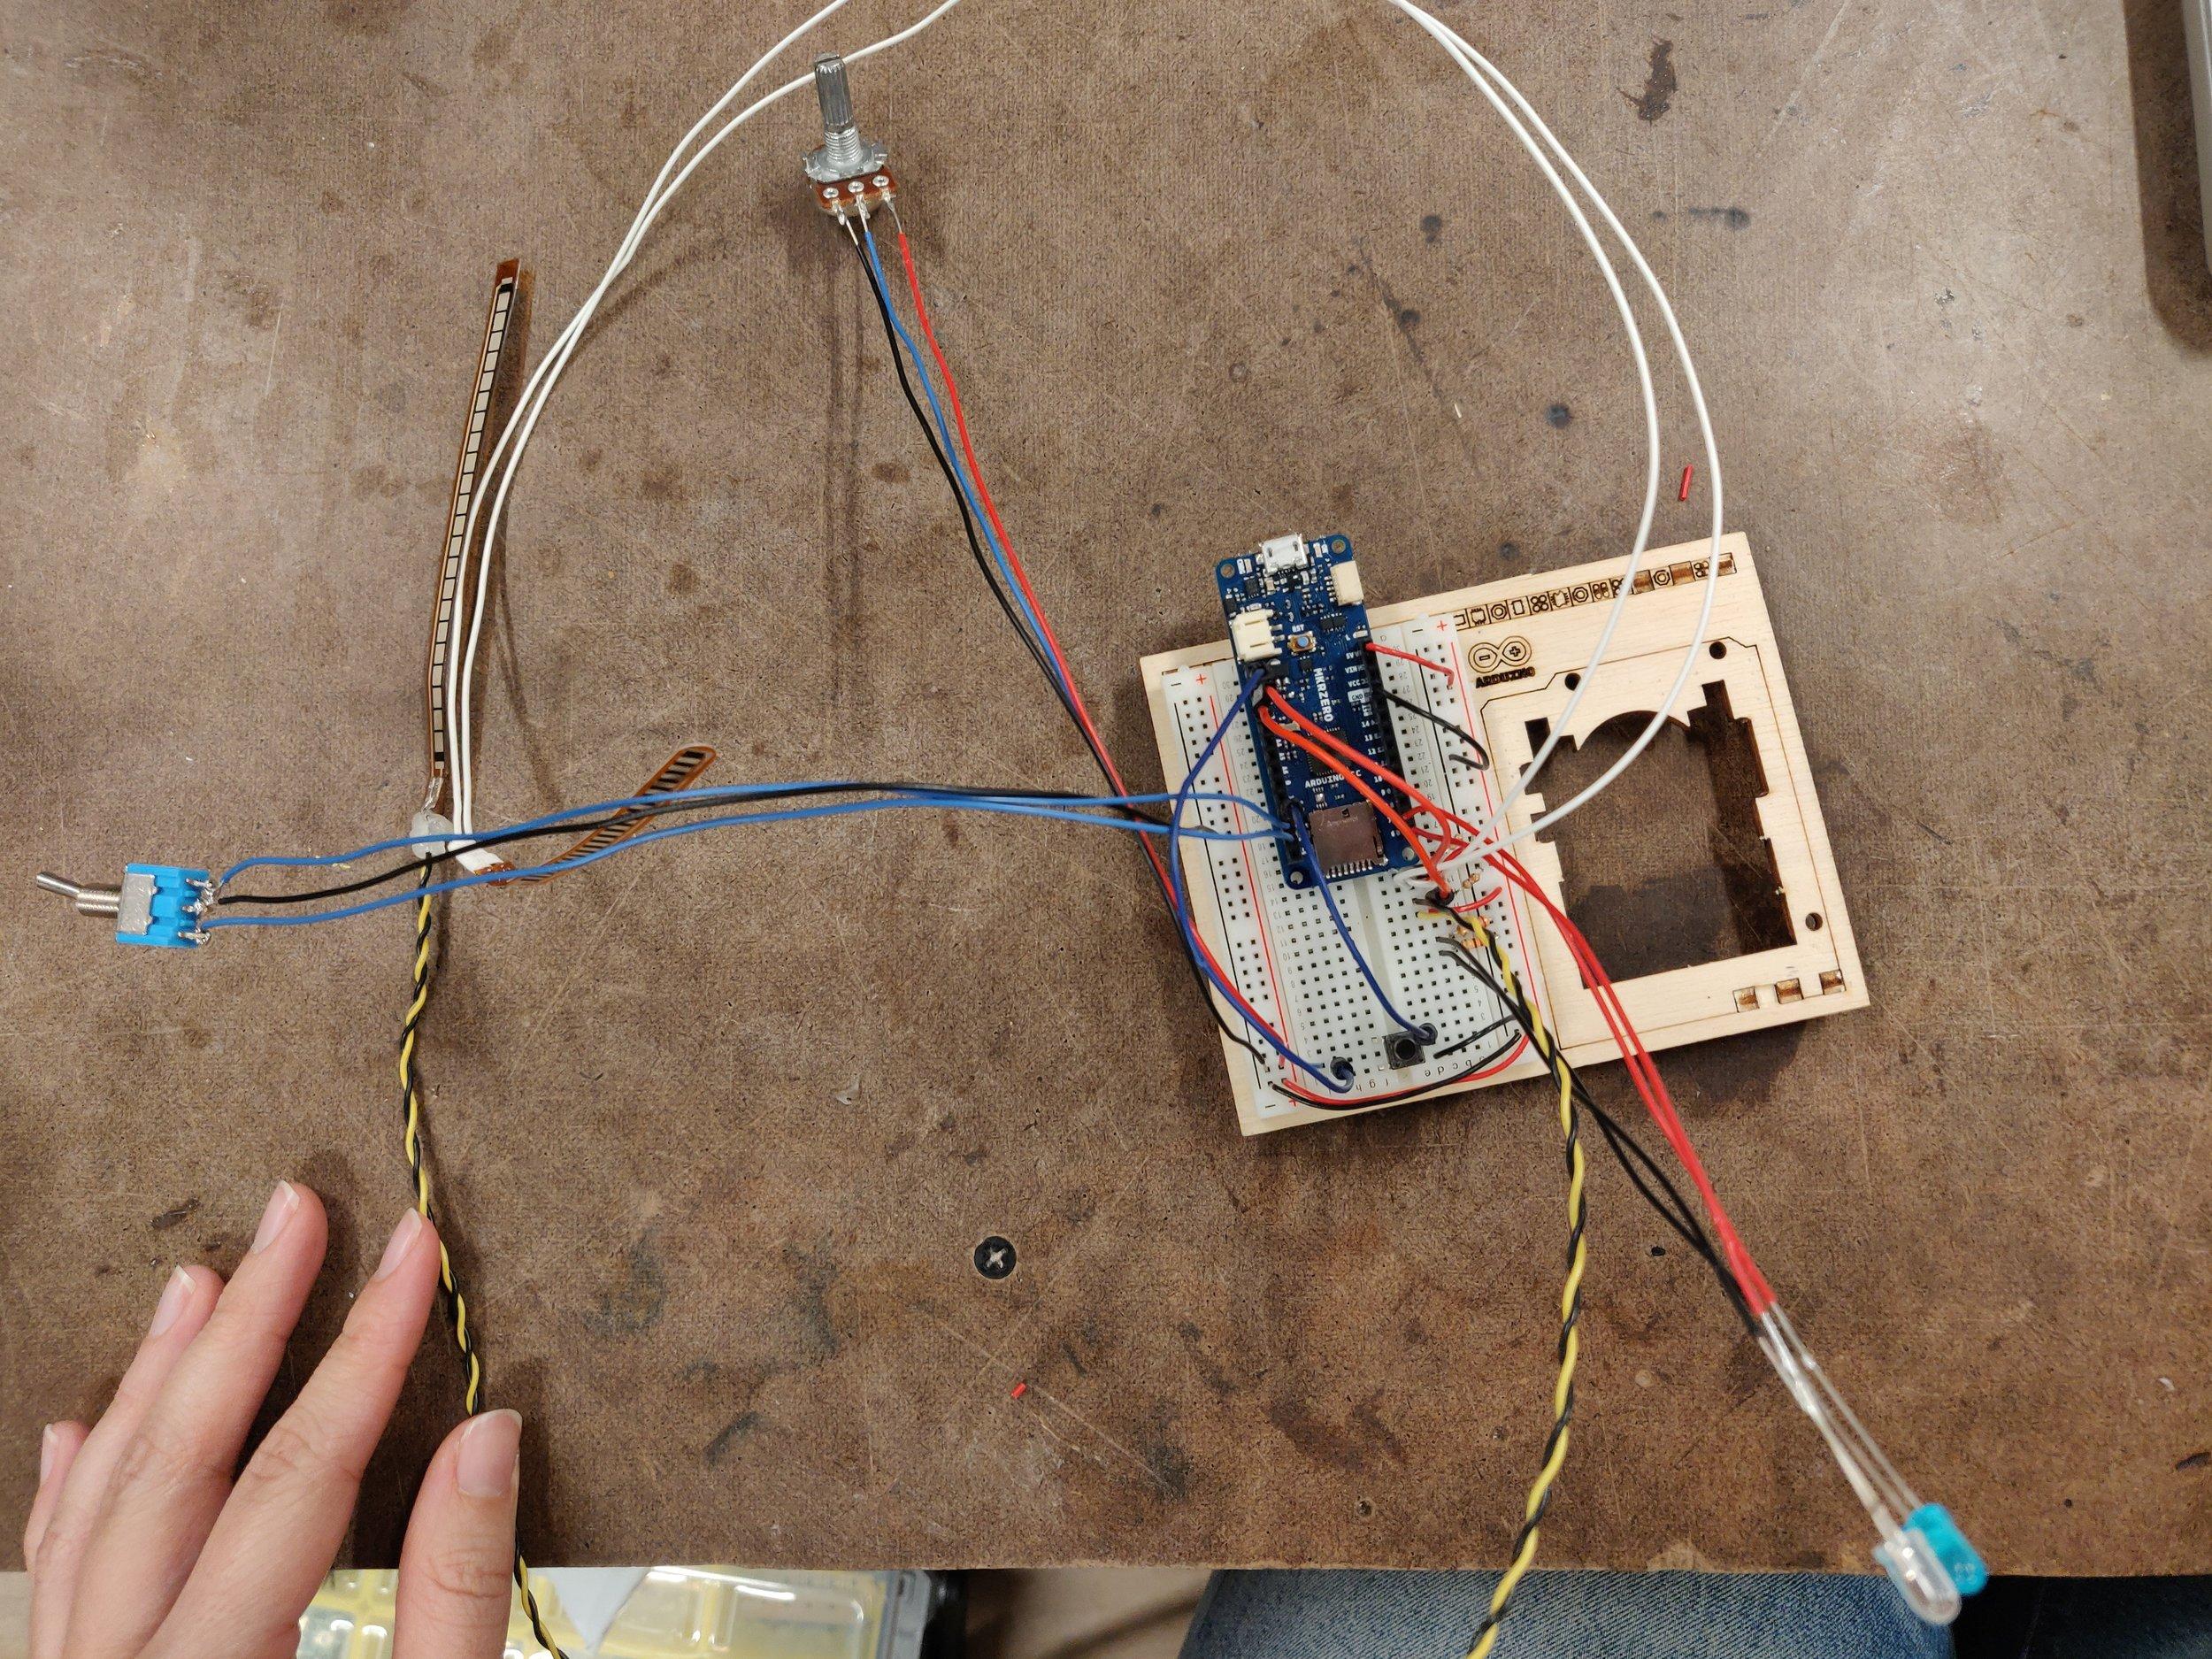 Sensors and components